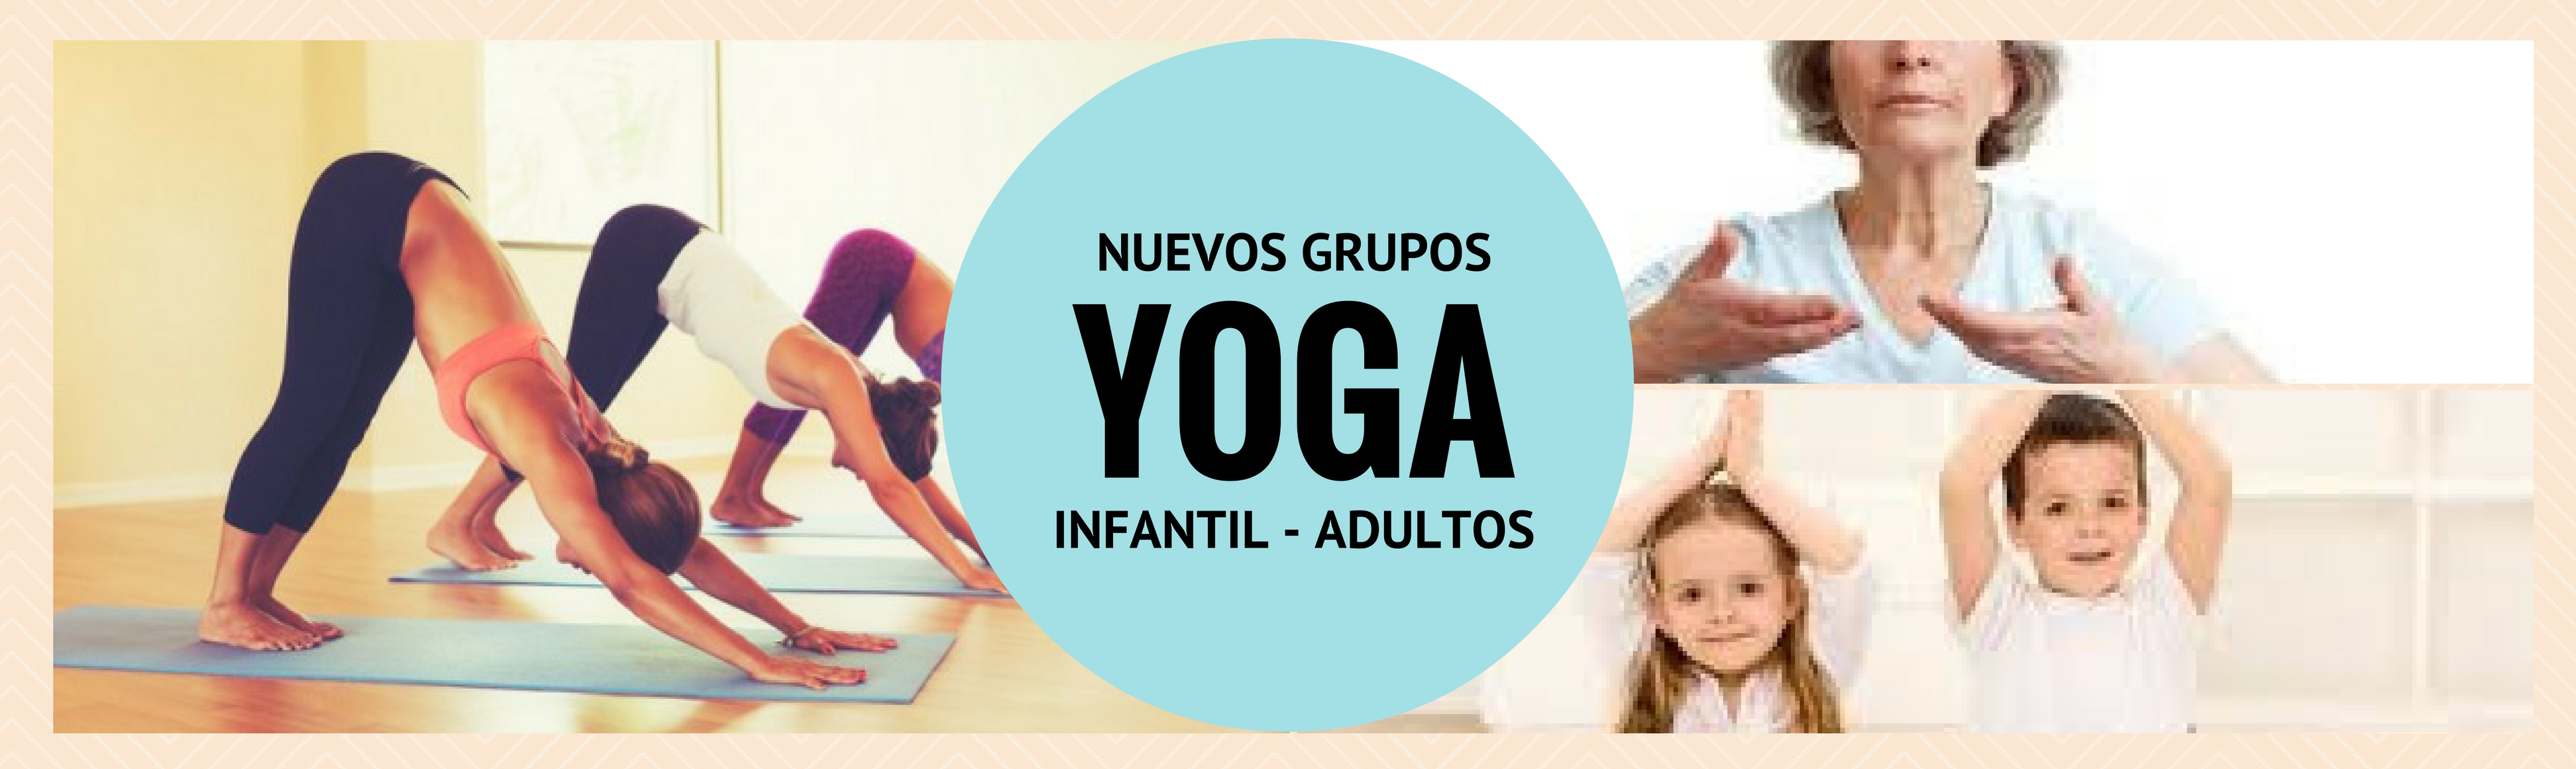 yoga_segundo-banner